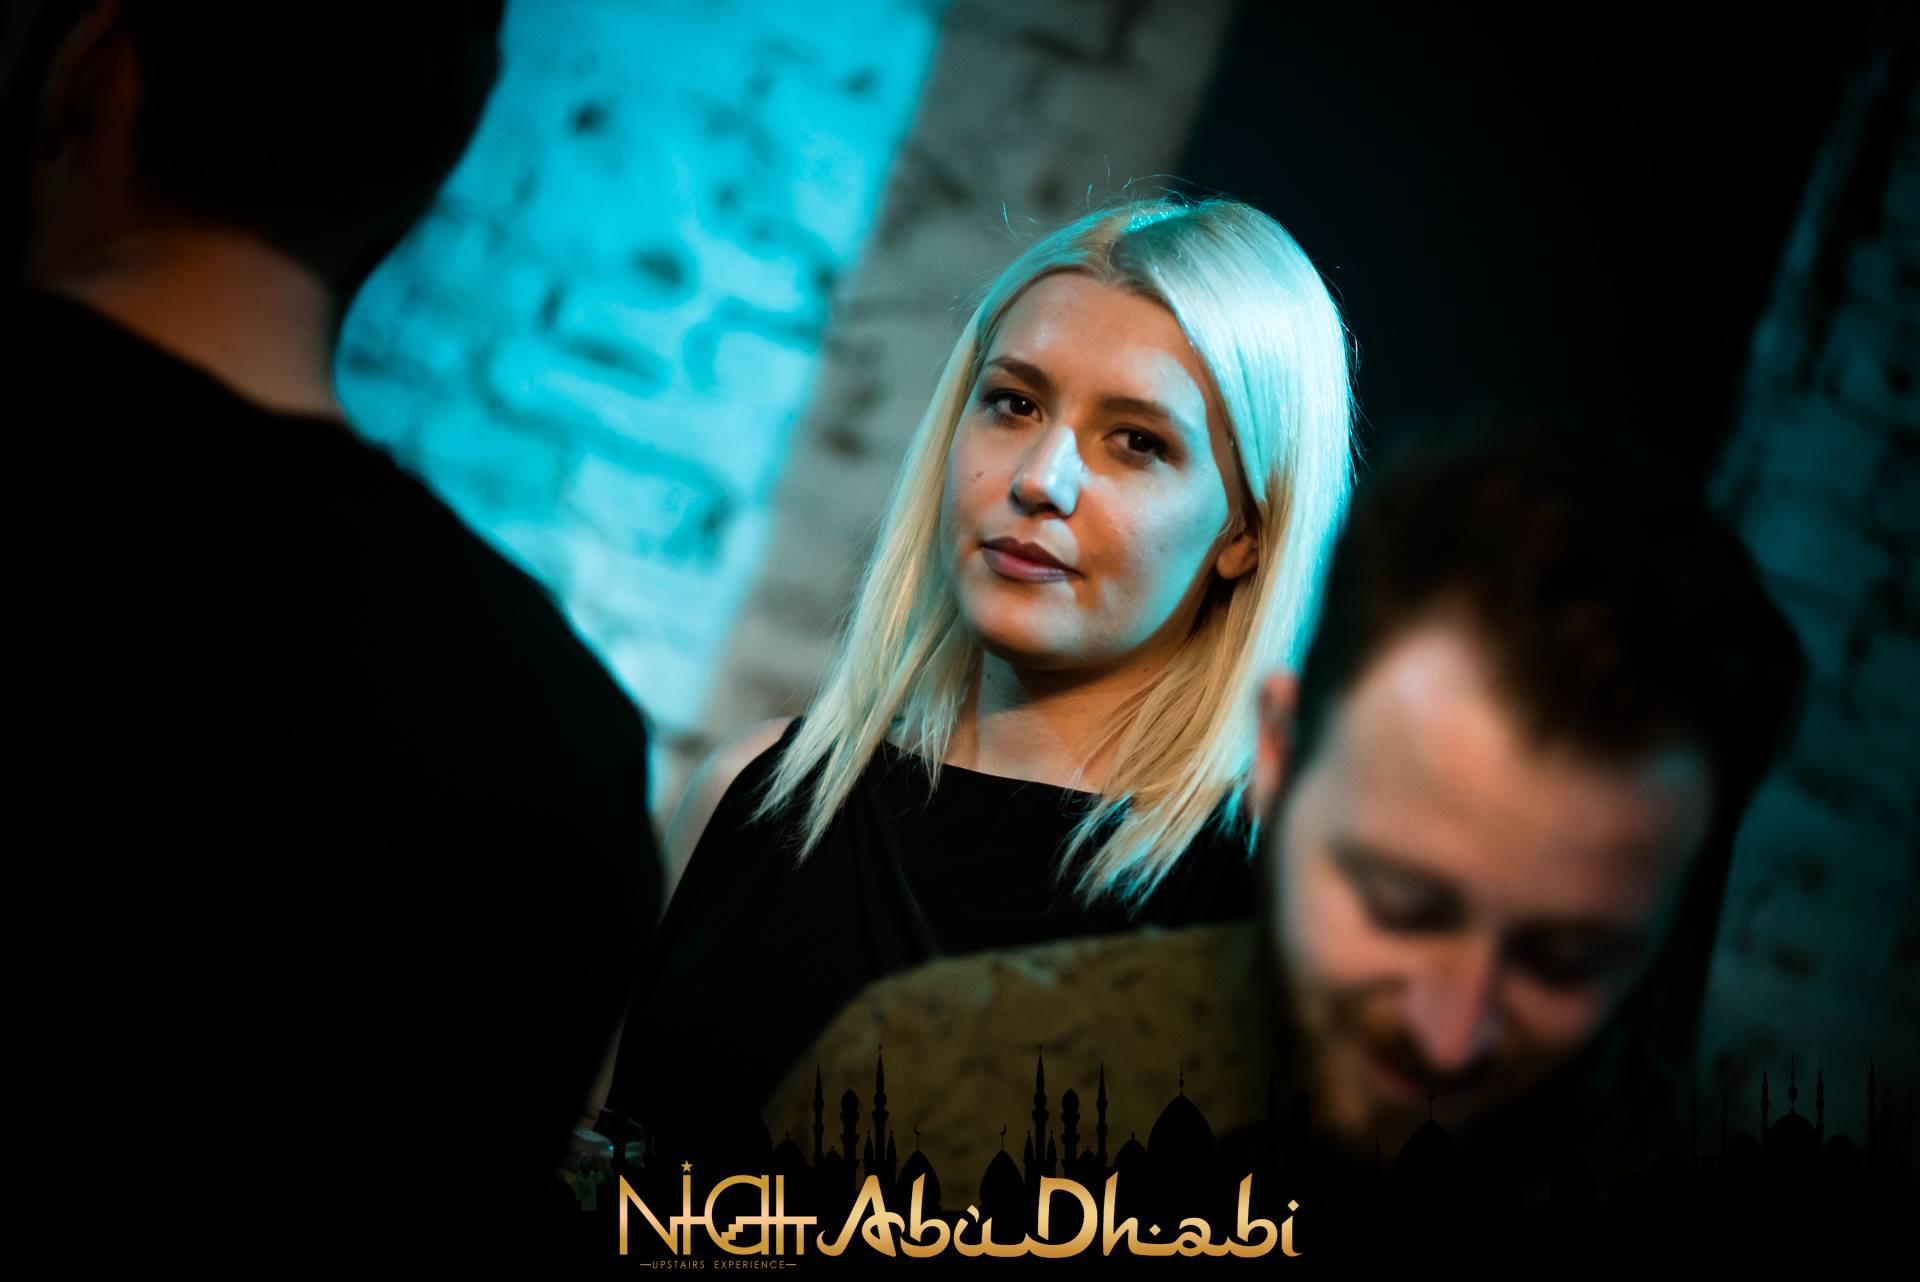 n8 - Ότι καλύτερο είδαμε στο Night! (Παρασκευή 20 Οκτωβρίου)